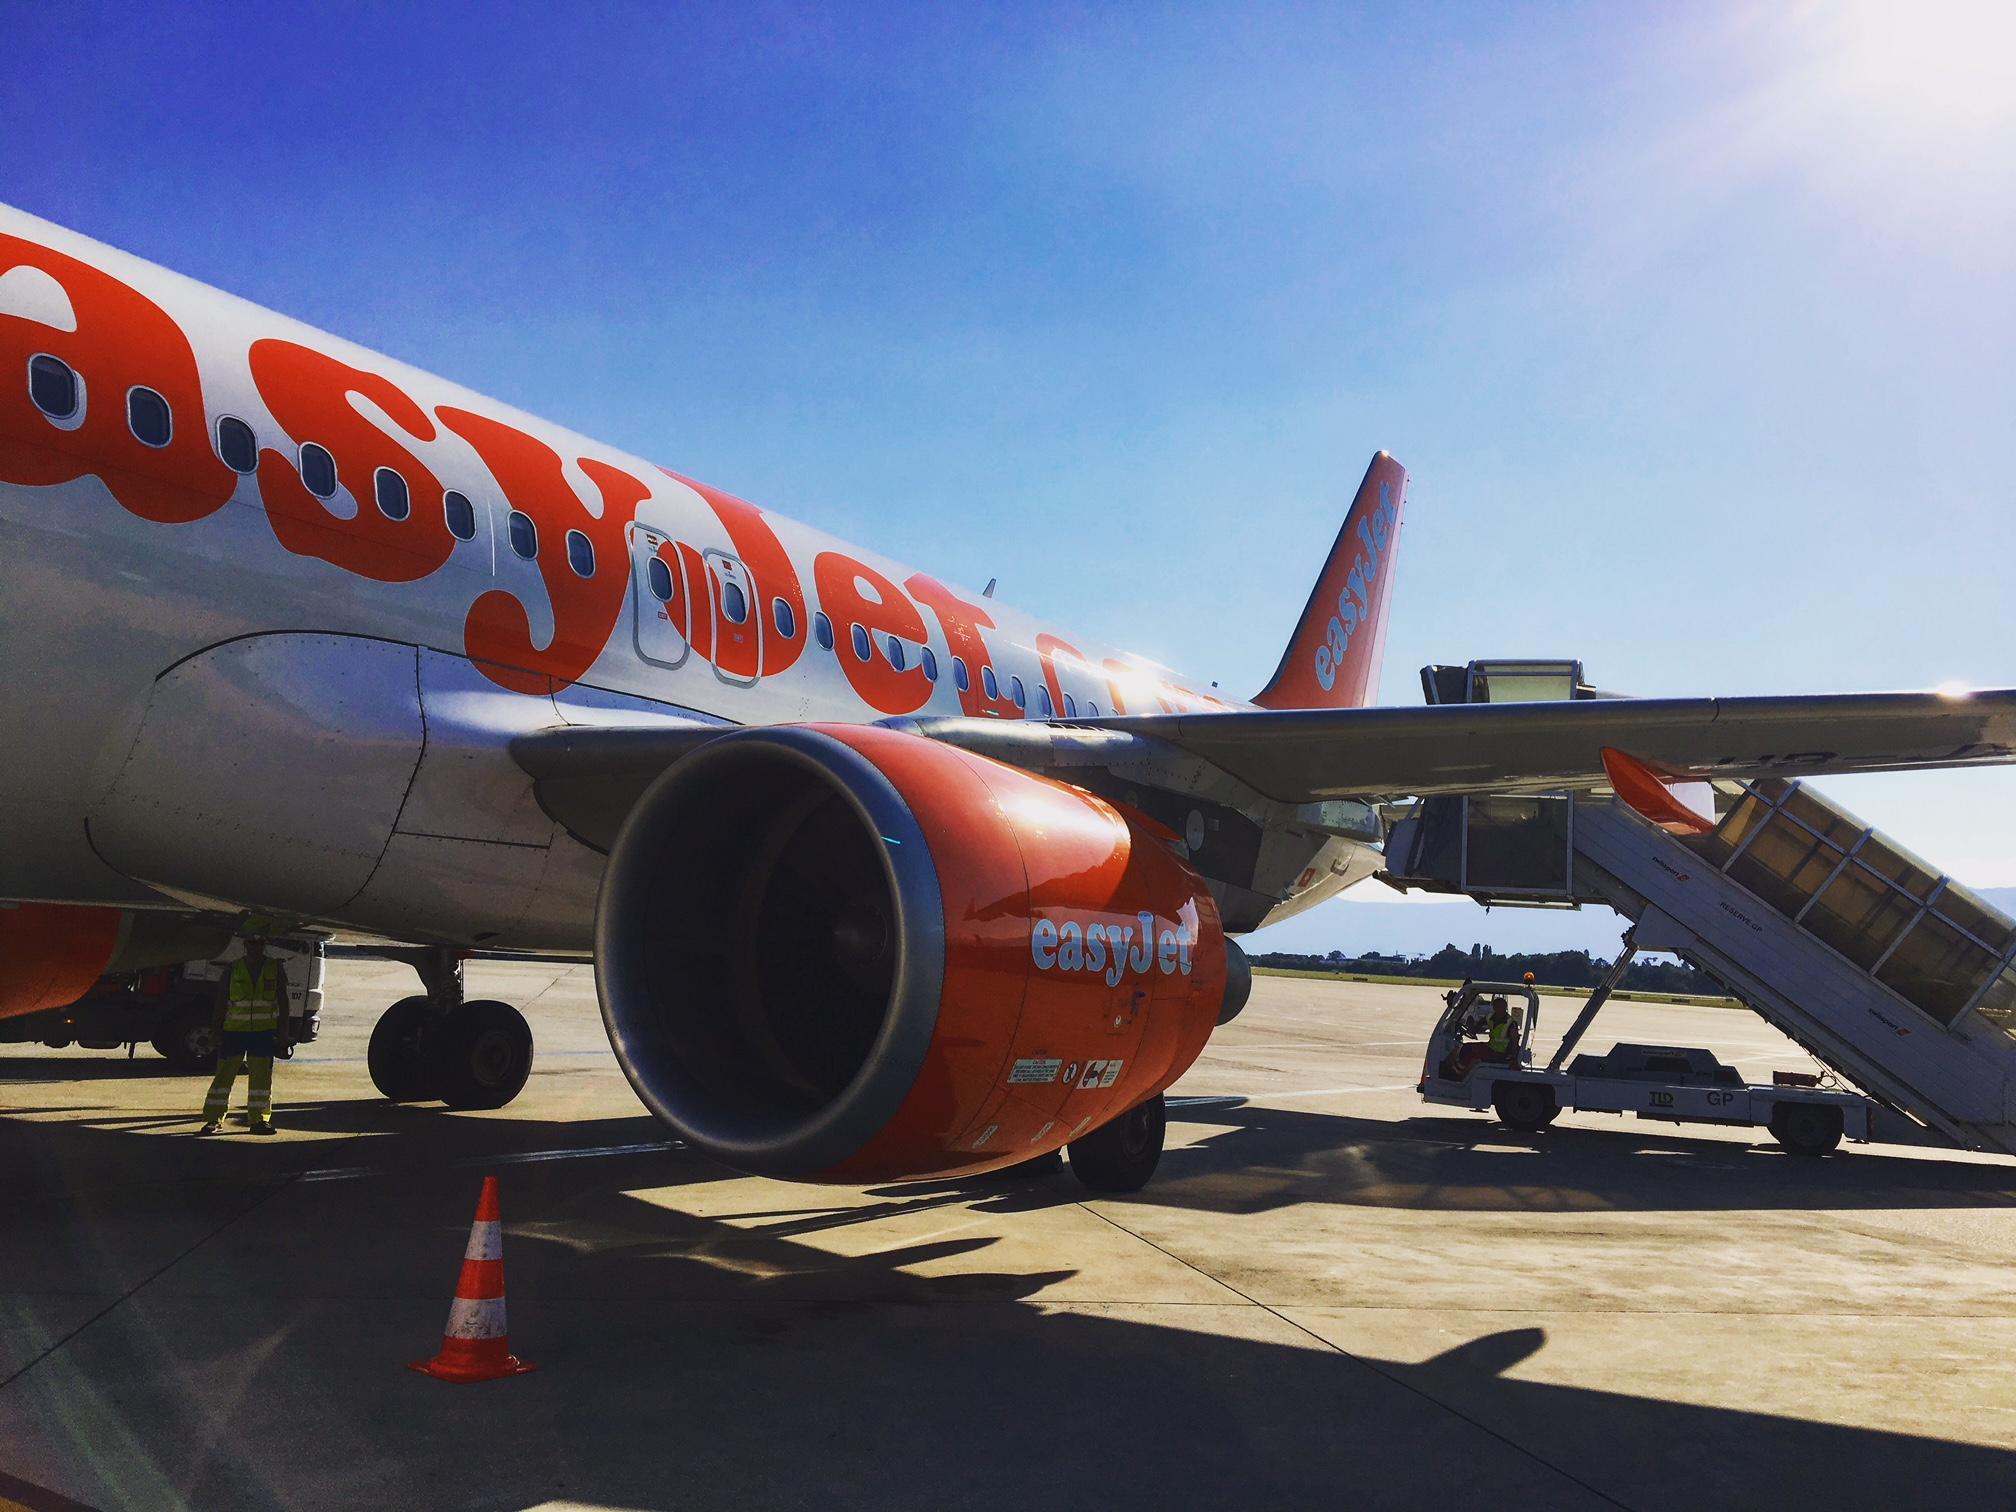 EasyJet A320 in GVA